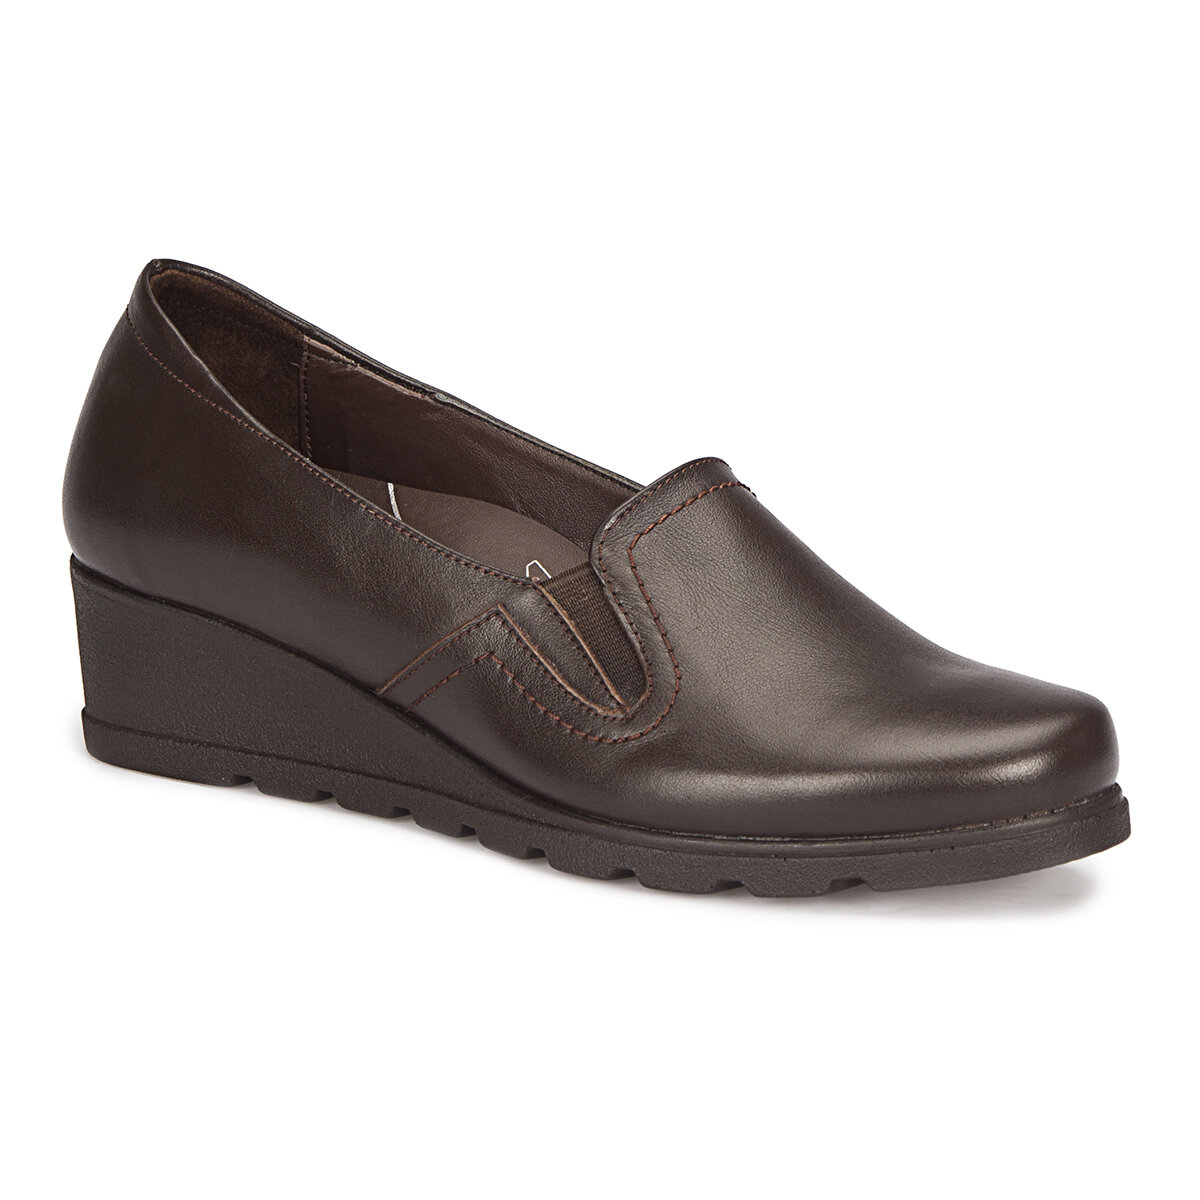 FLO 72.110072.Z Brown Women 'S Shoes Polaris 5 Point